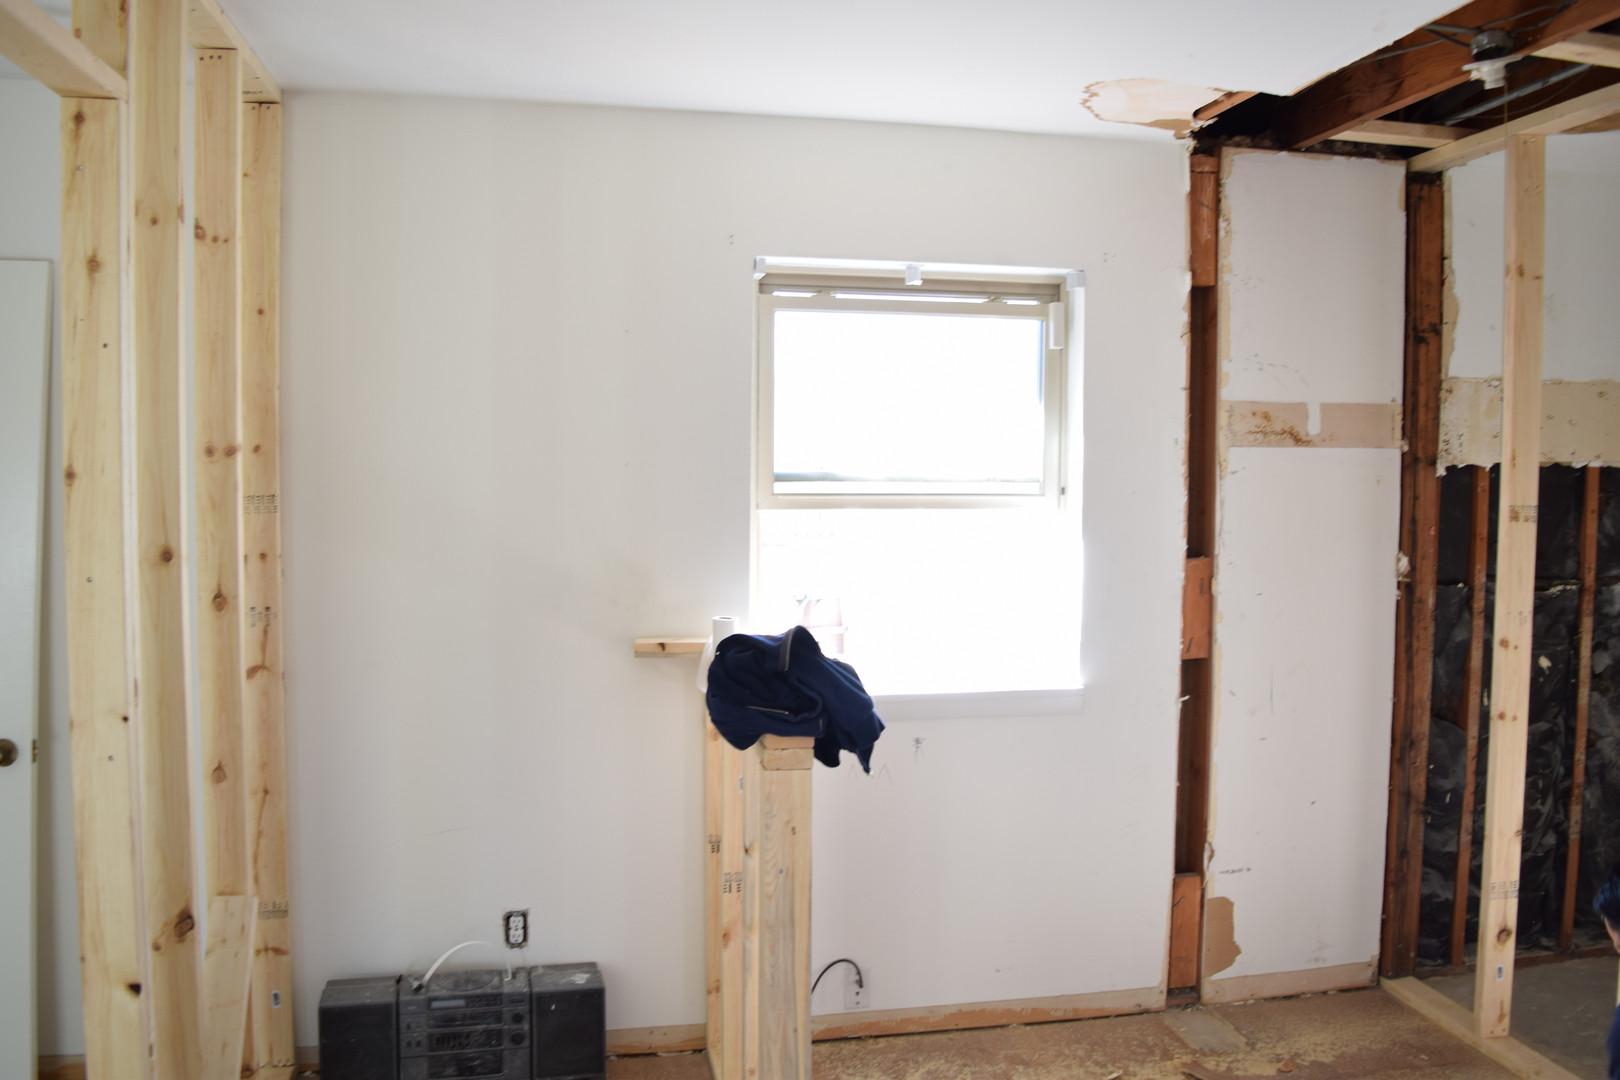 Bathroom Remove Walls Phase